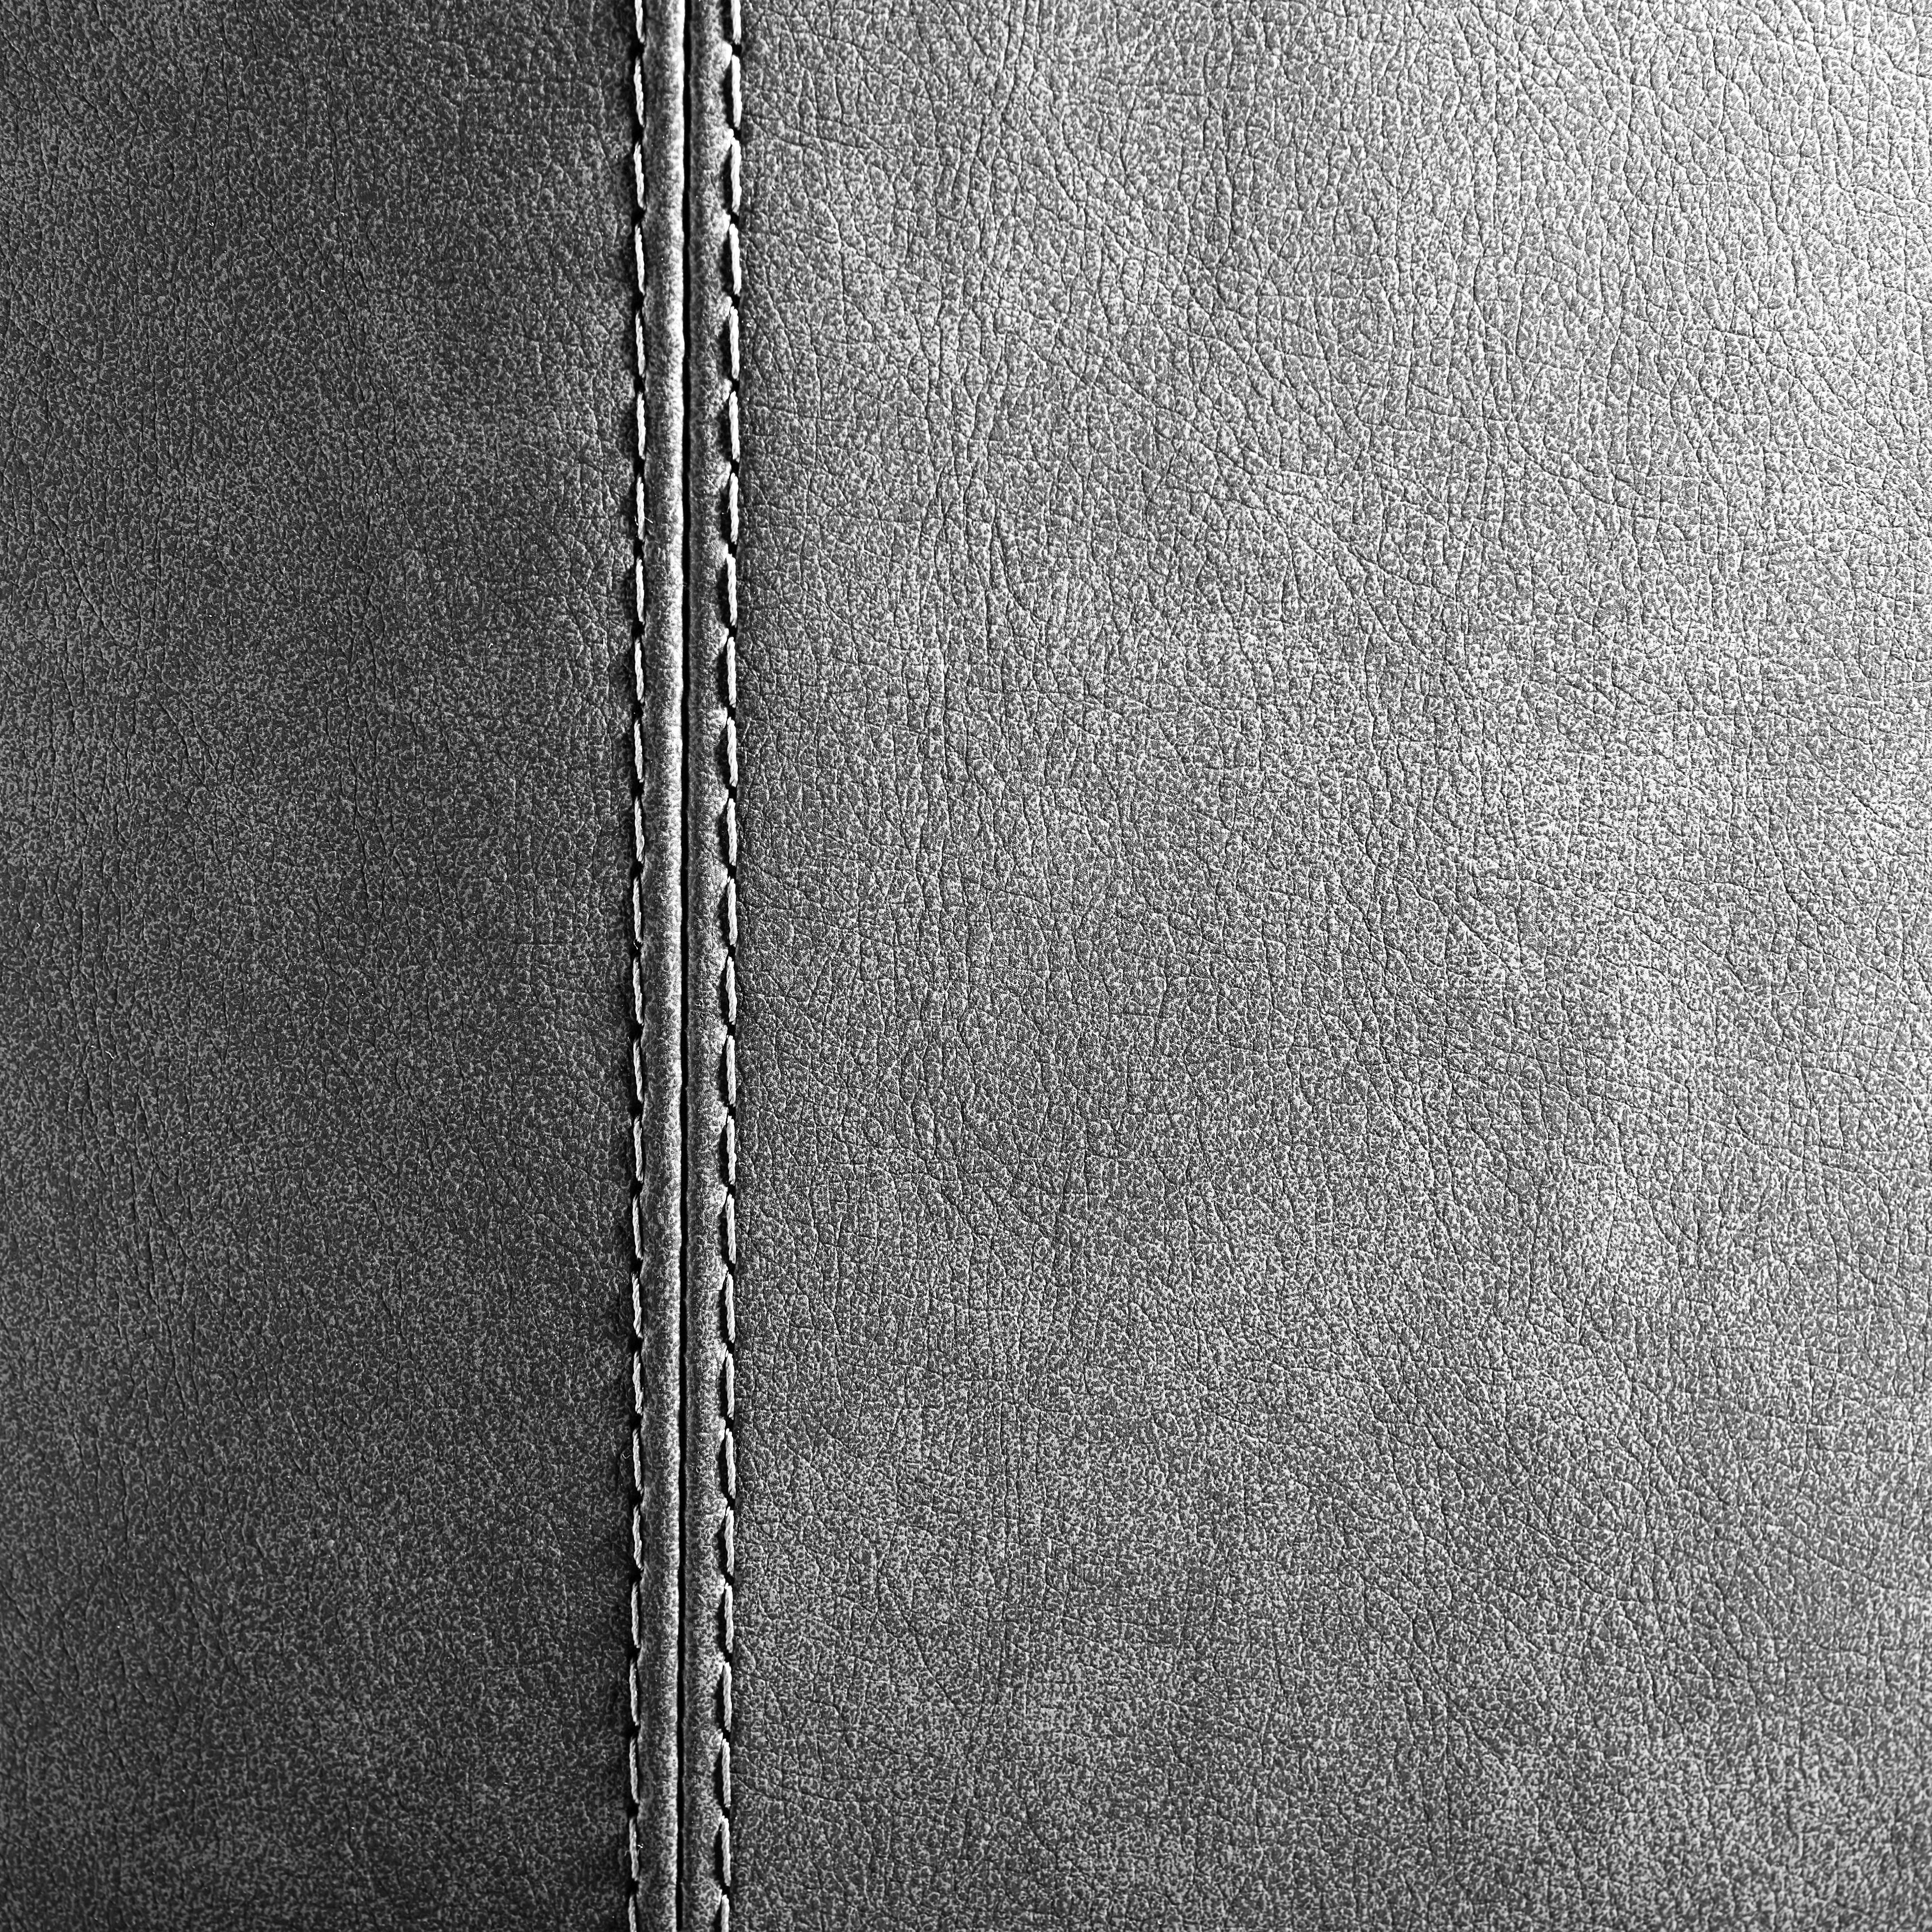 STUHL Eiche massiv Anthrazit, Eichefarben - Eichefarben/Anthrazit, KONVENTIONELL, Holz/Textil (49/105/62cm) - LINEA NATURA